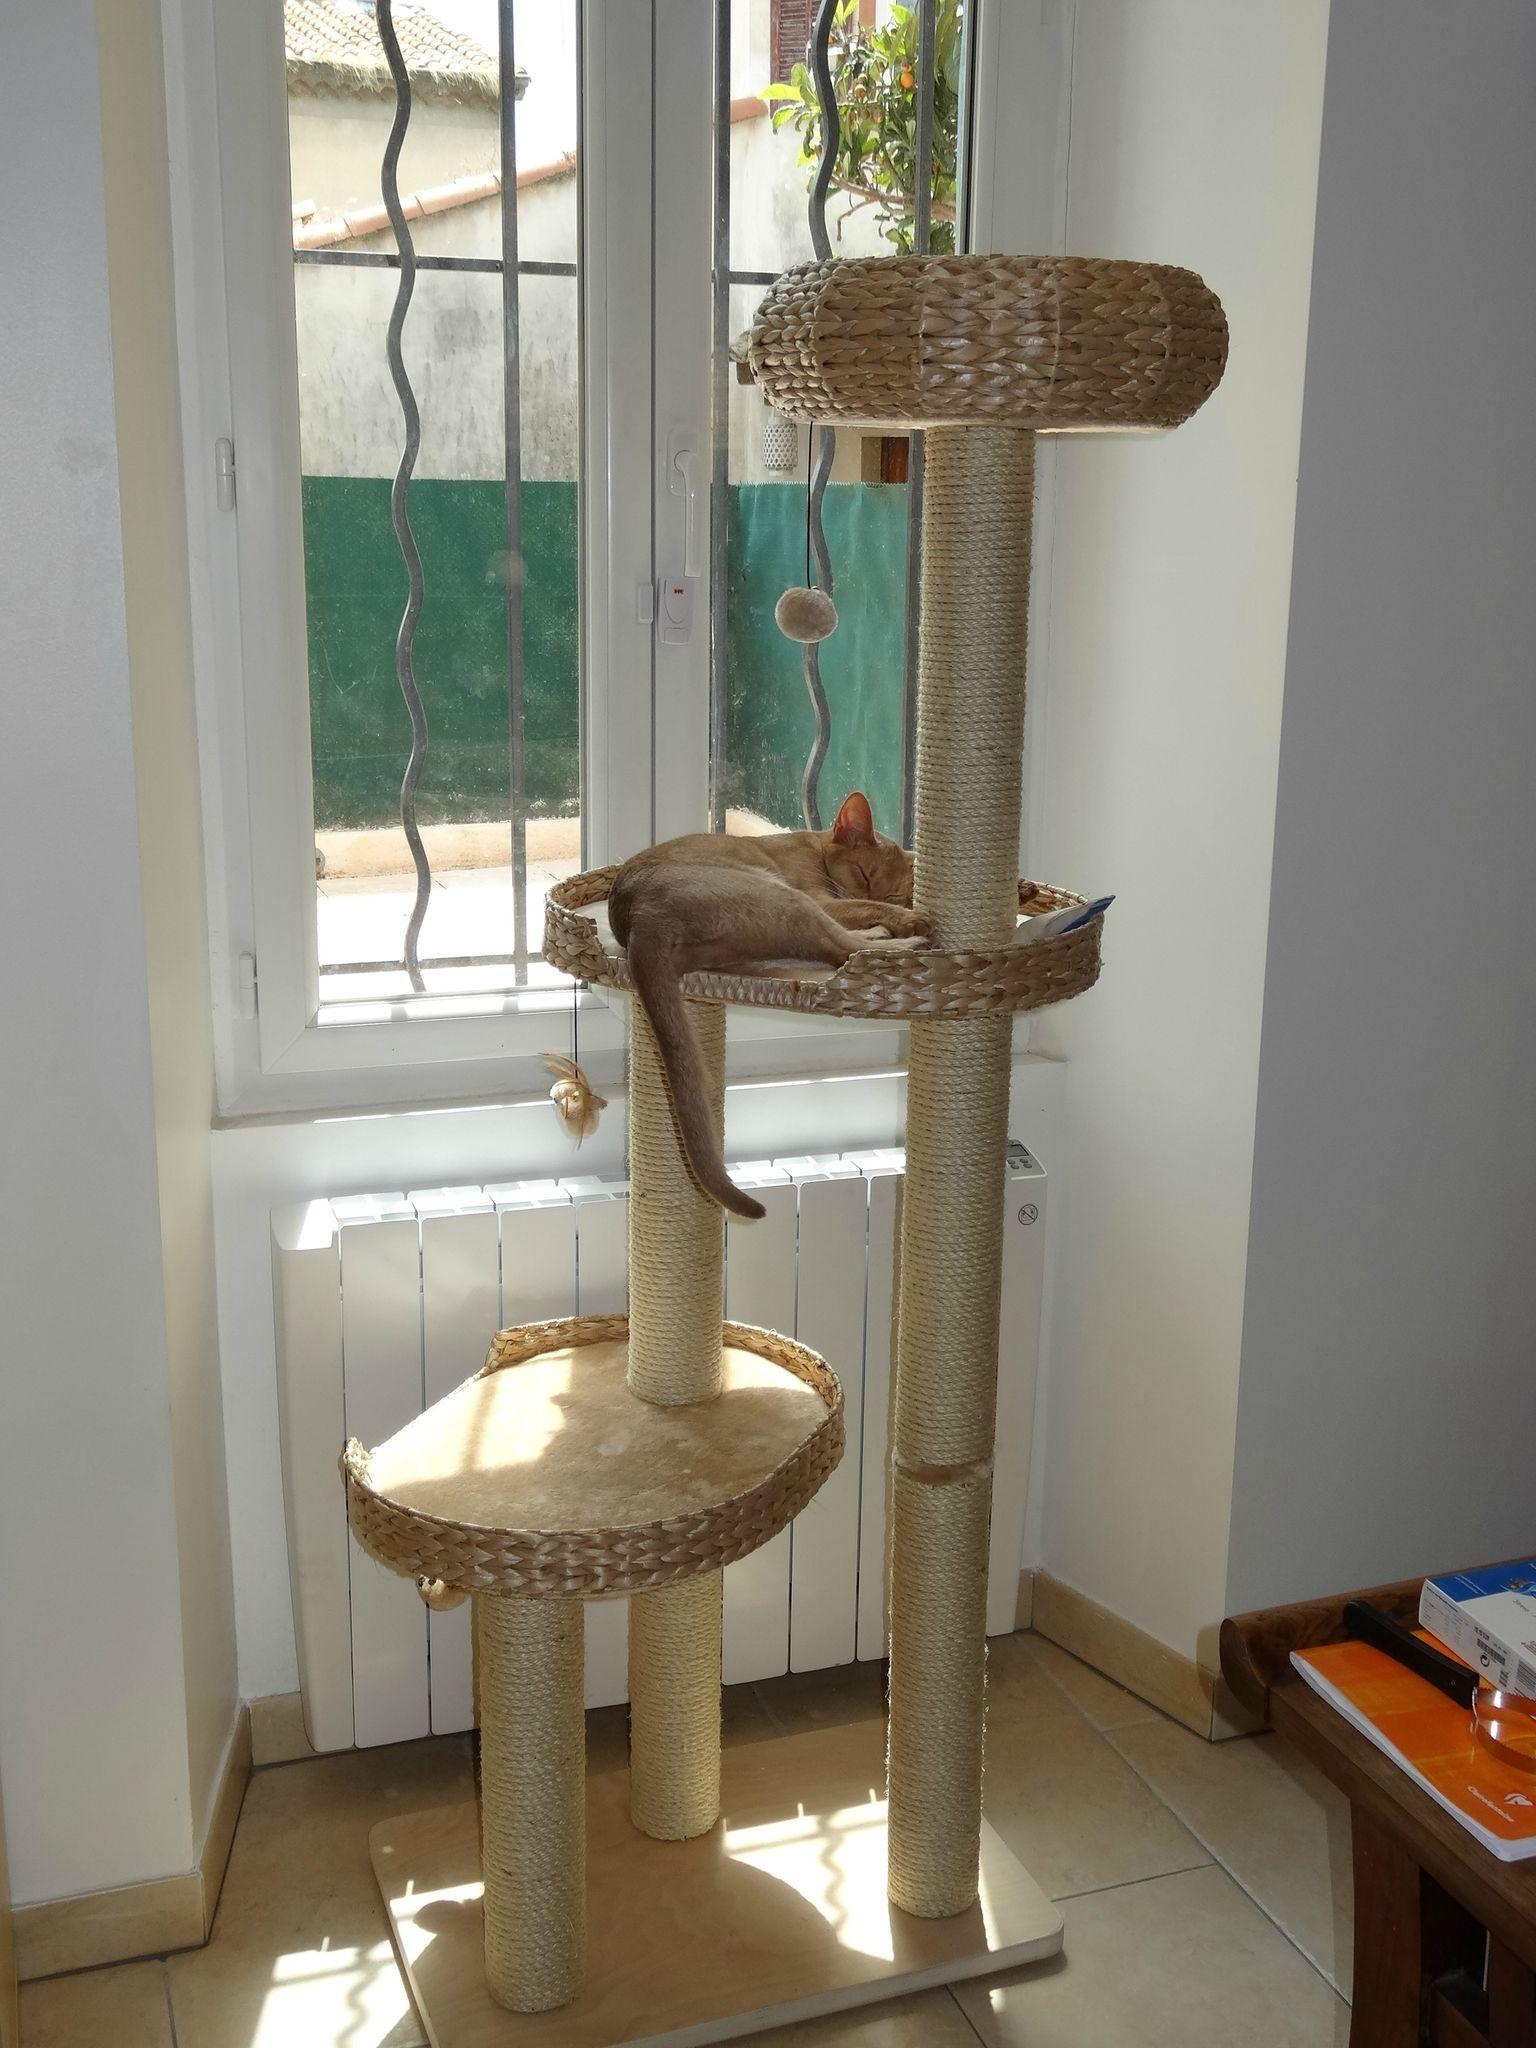 arbre a chat jacinthe d 39 eau. Black Bedroom Furniture Sets. Home Design Ideas